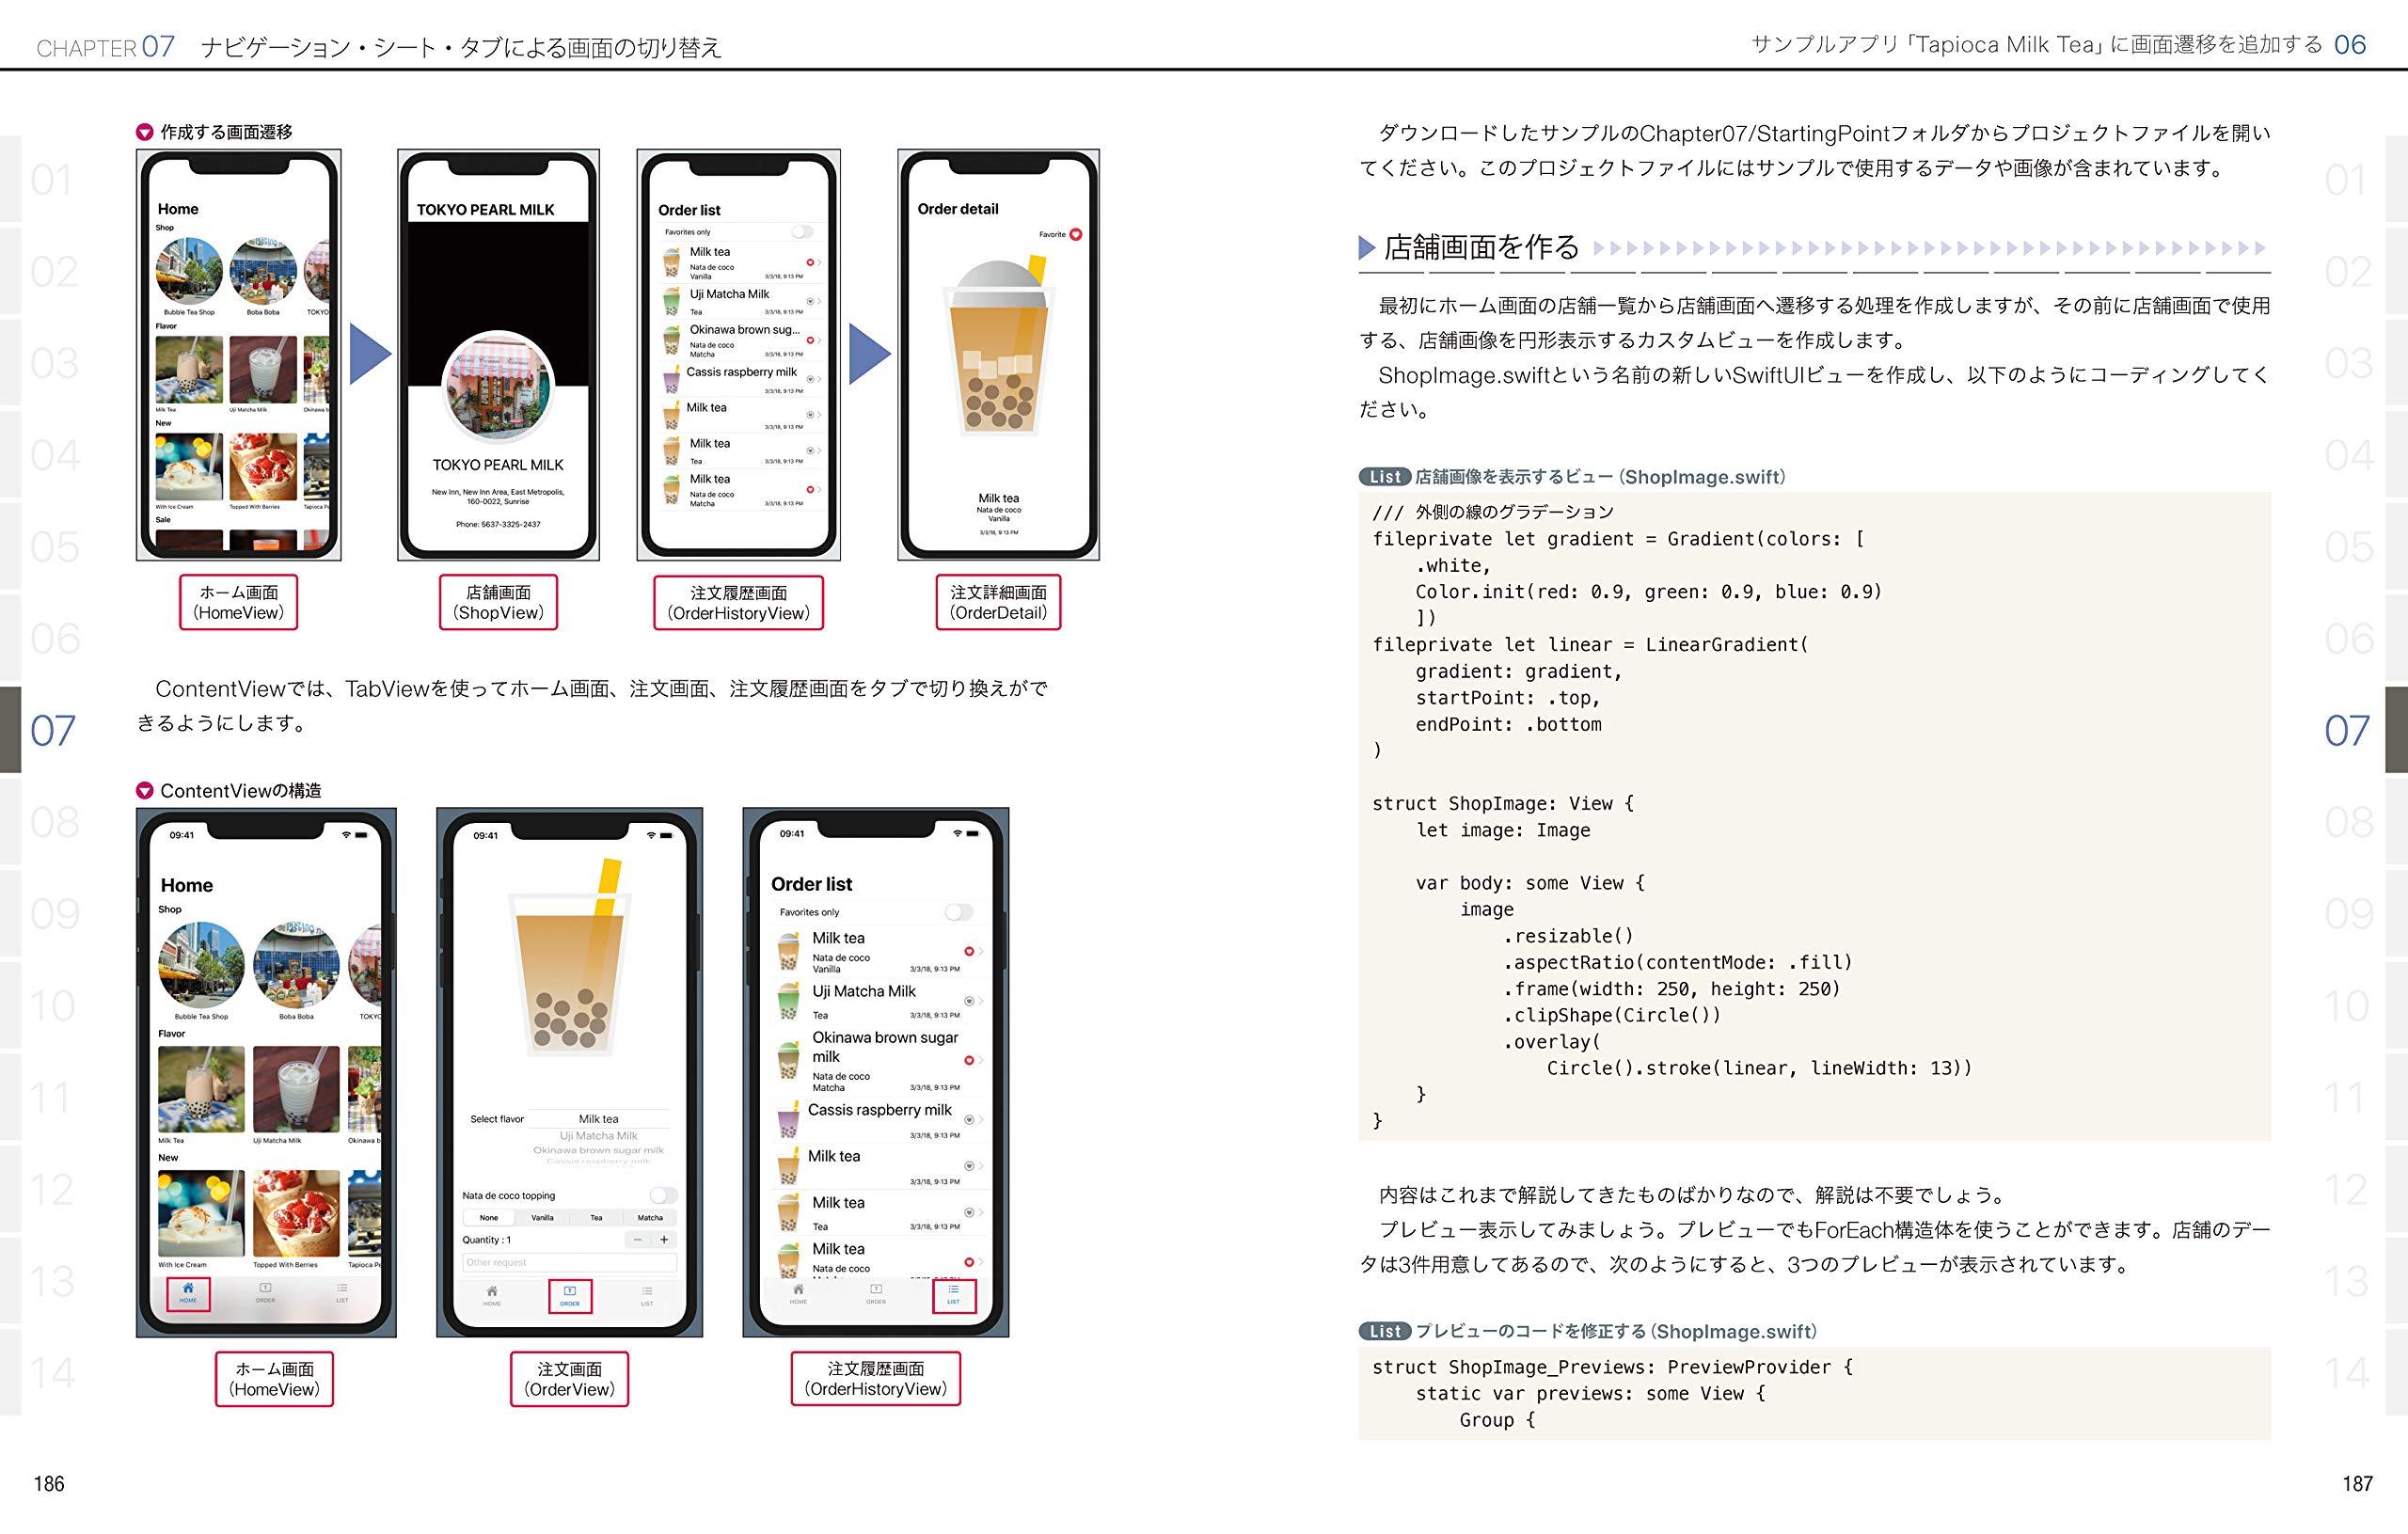 Thumbnail of SwiftUI 徹底入門3$